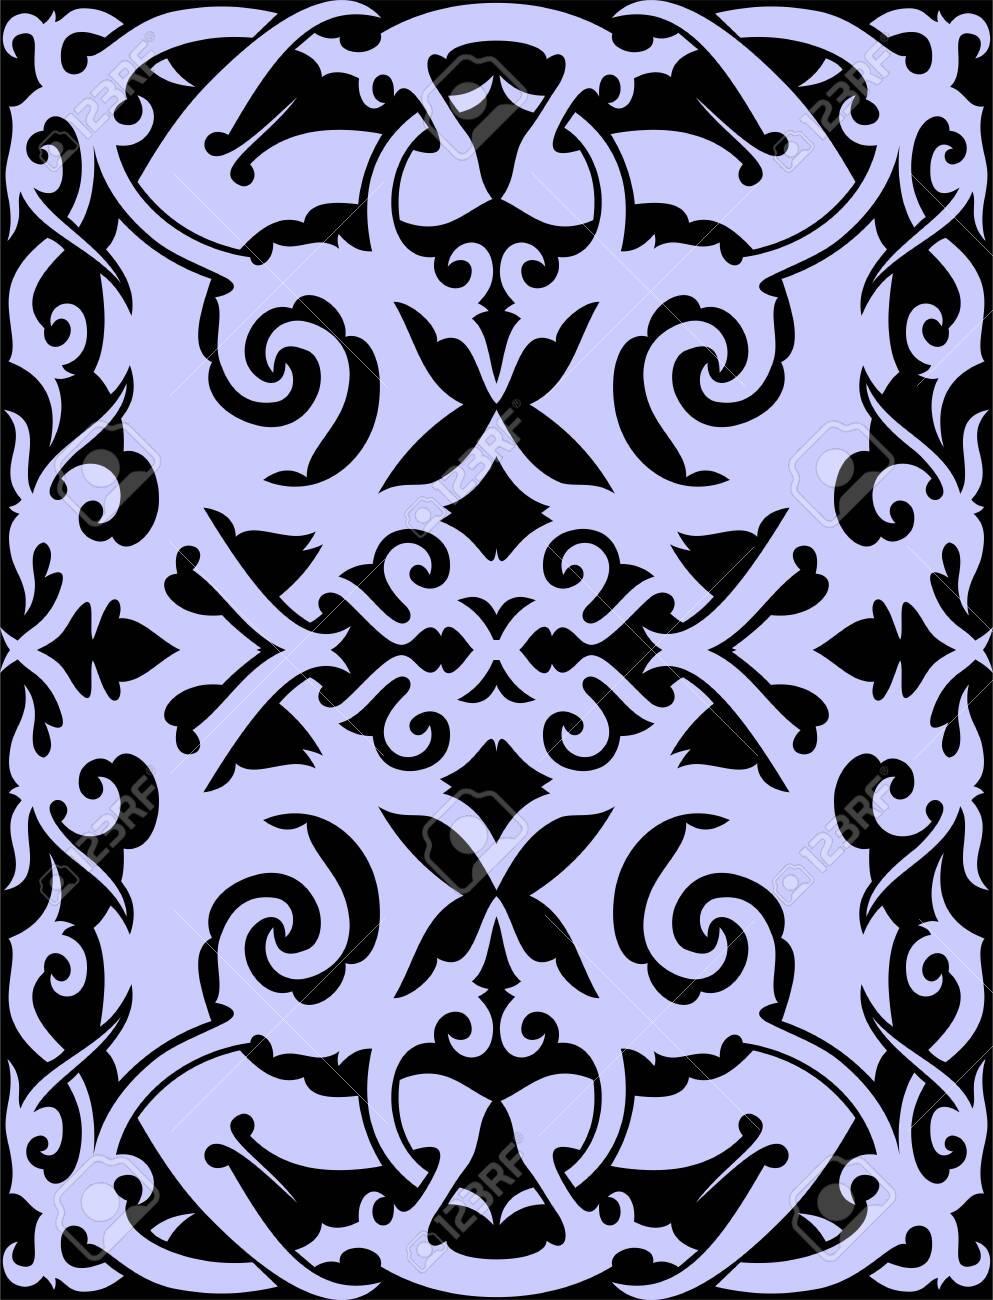 87 Gambar Batik Dayak Paling Bagus Gambar Pixabay